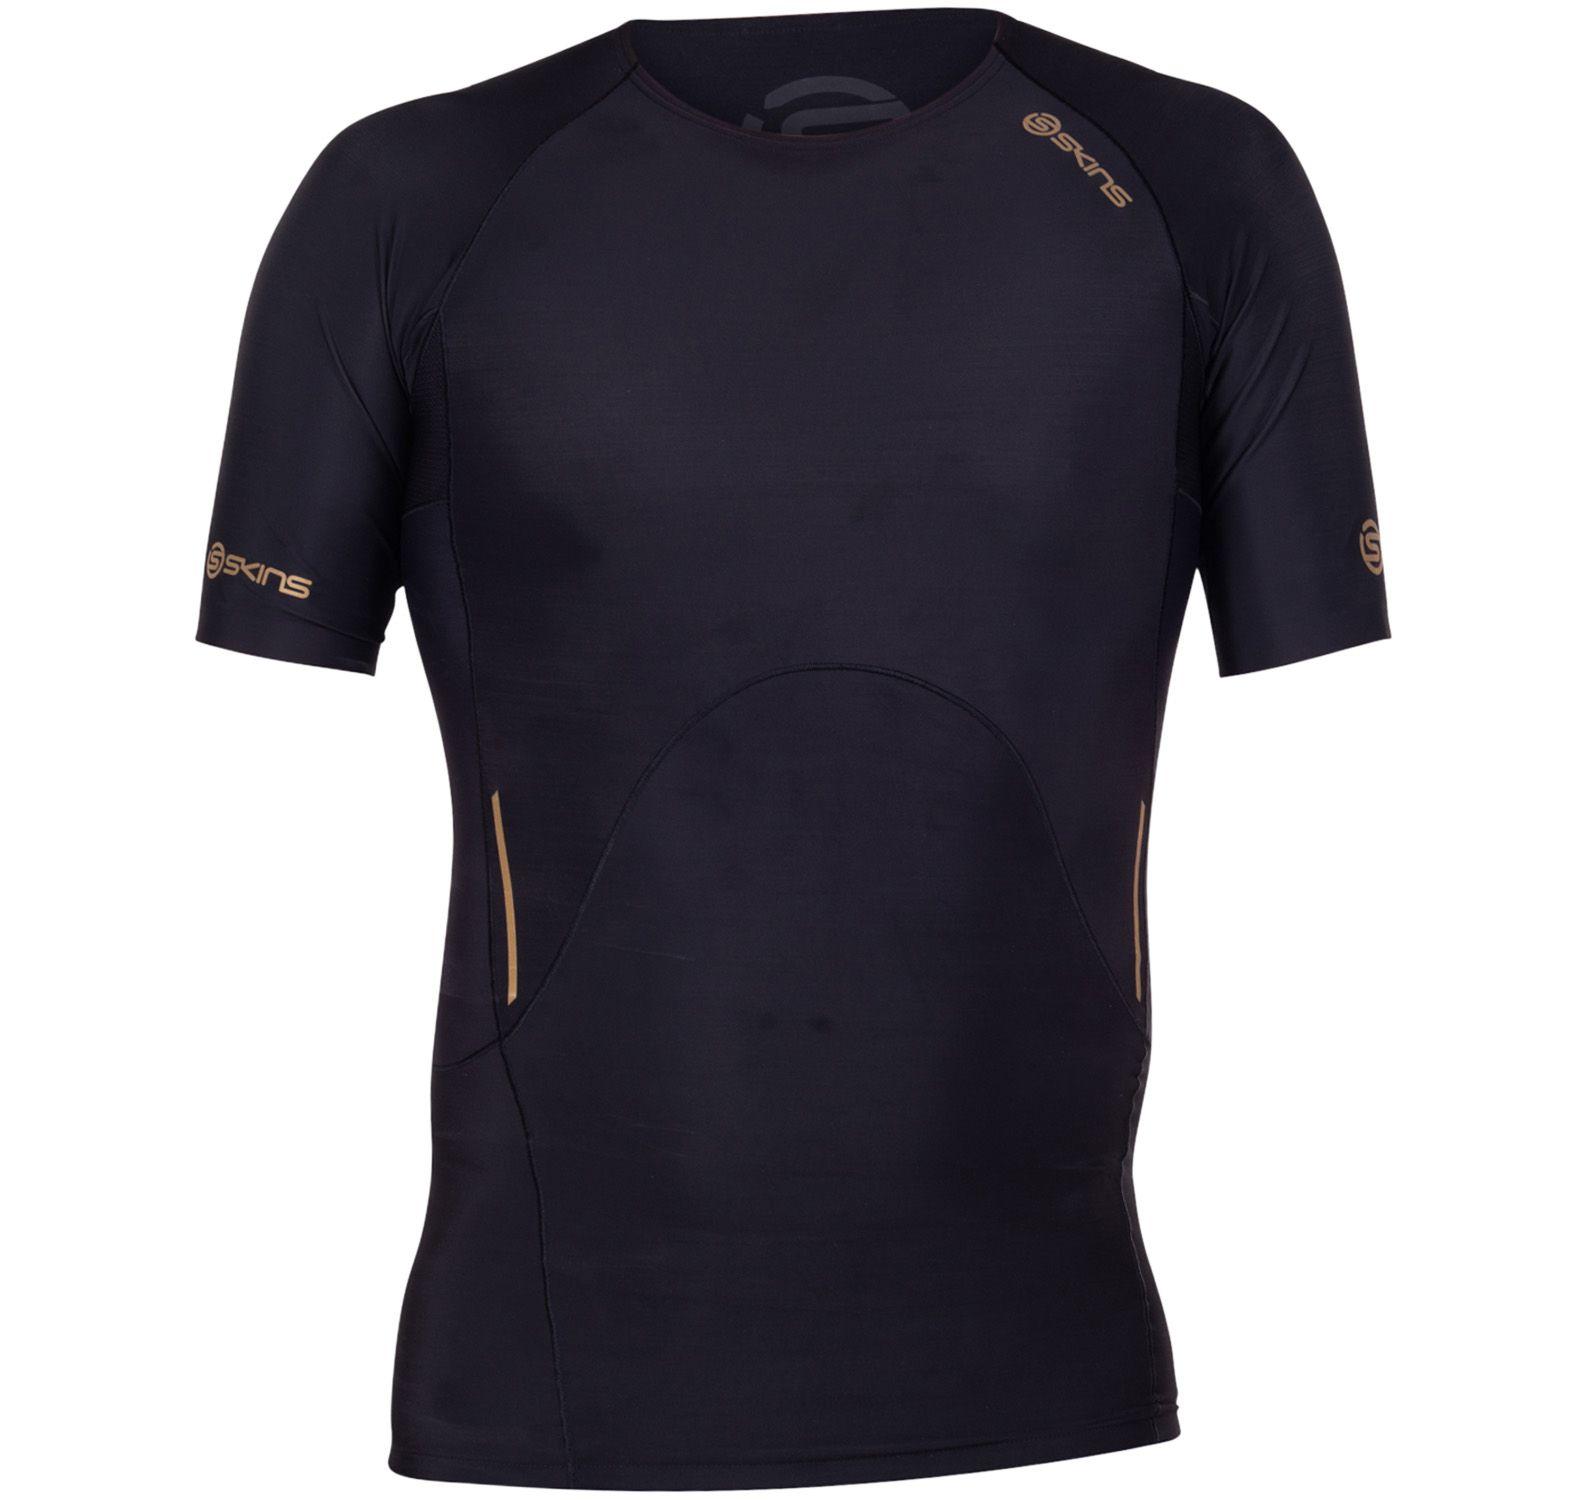 A400 Mens Top Short Sleeve, Black, Xl,  Skins